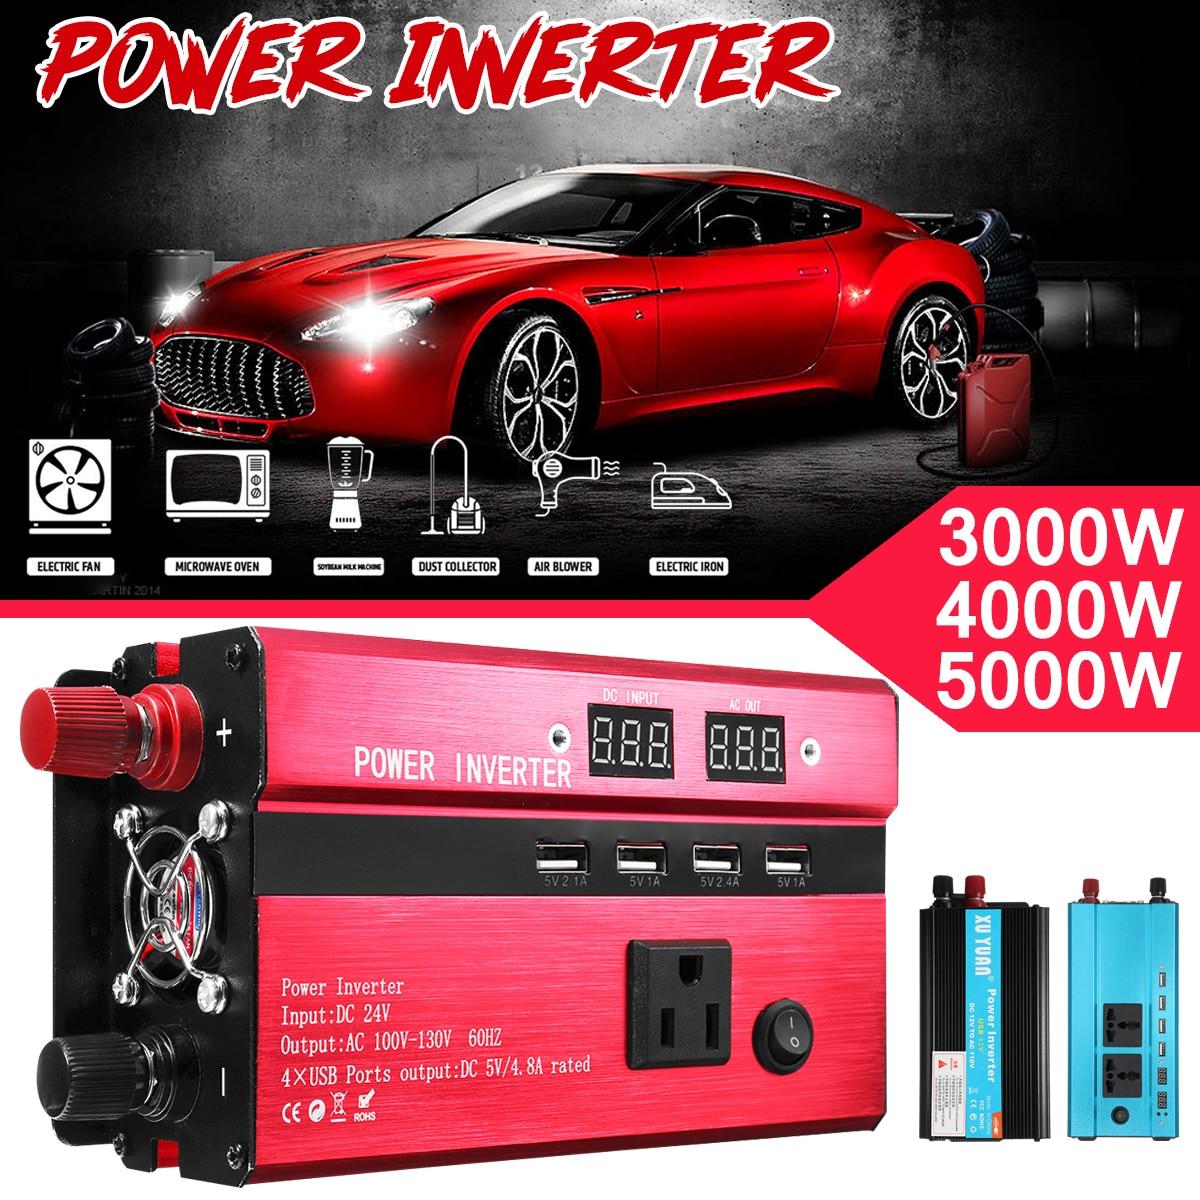 12V 220V Solar Power Inverter 3kw/4kw/5kw/8kw/10kw Auto Inverter Spannung Transformator konverter Ladegerät Inverter 12V 220V